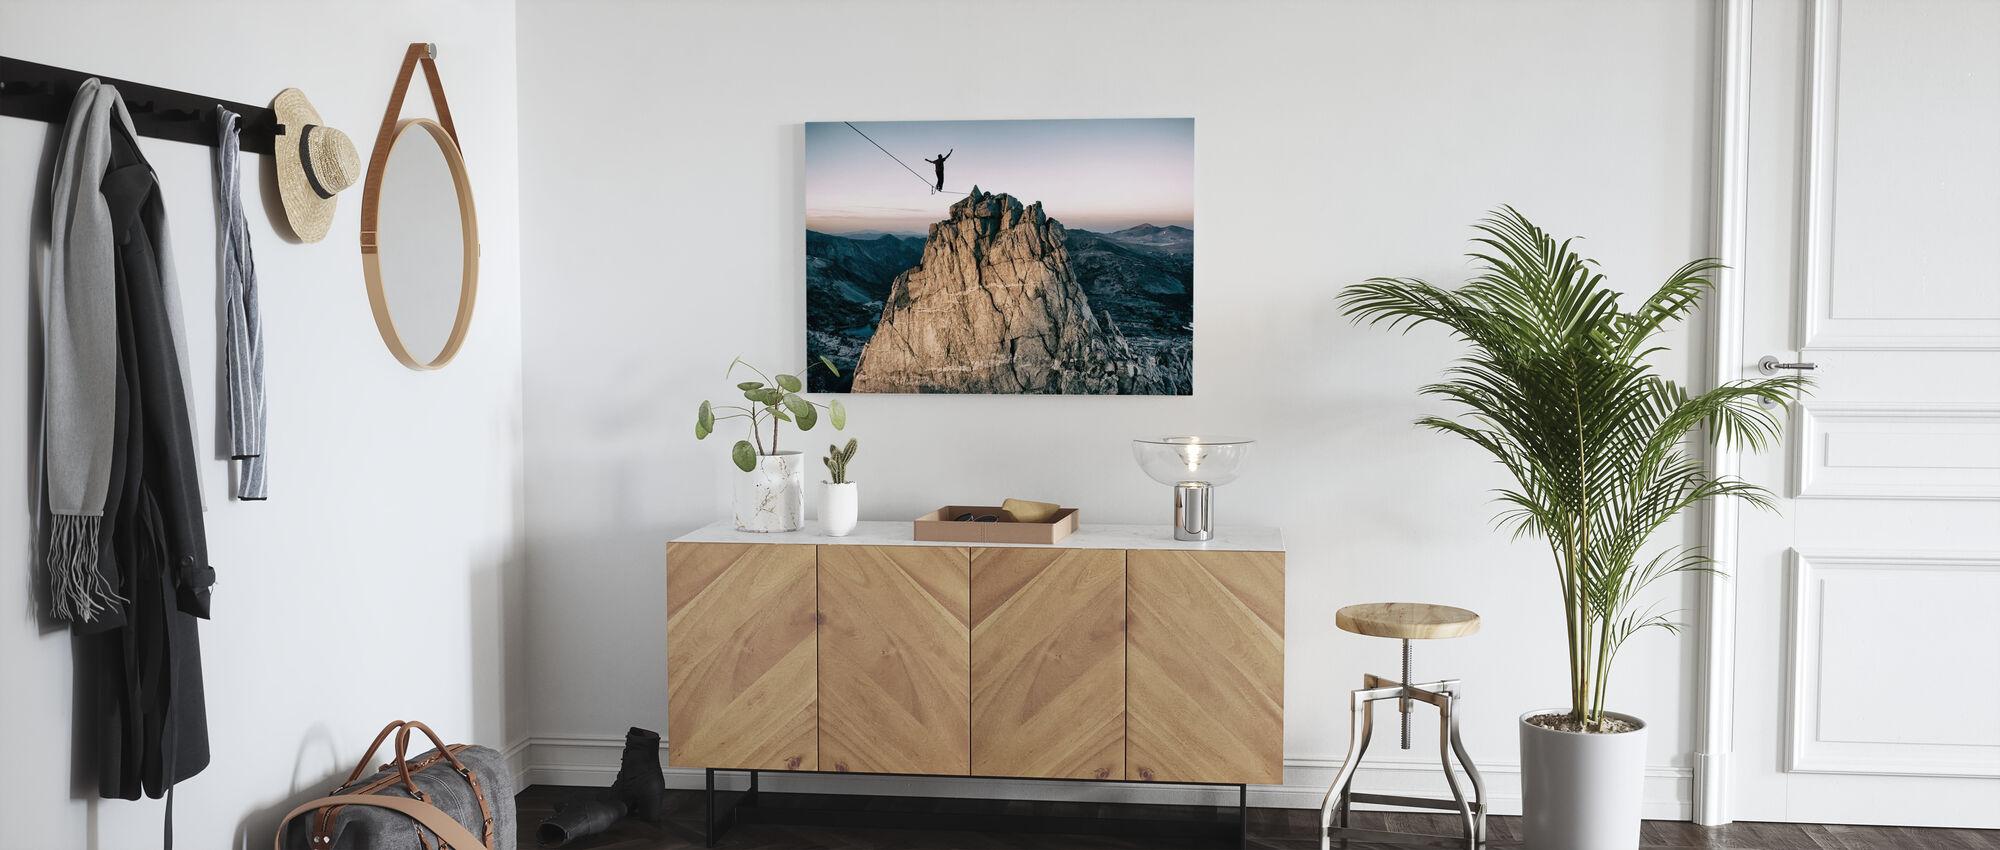 Slackline in the Mountains - Canvas print - Hallway